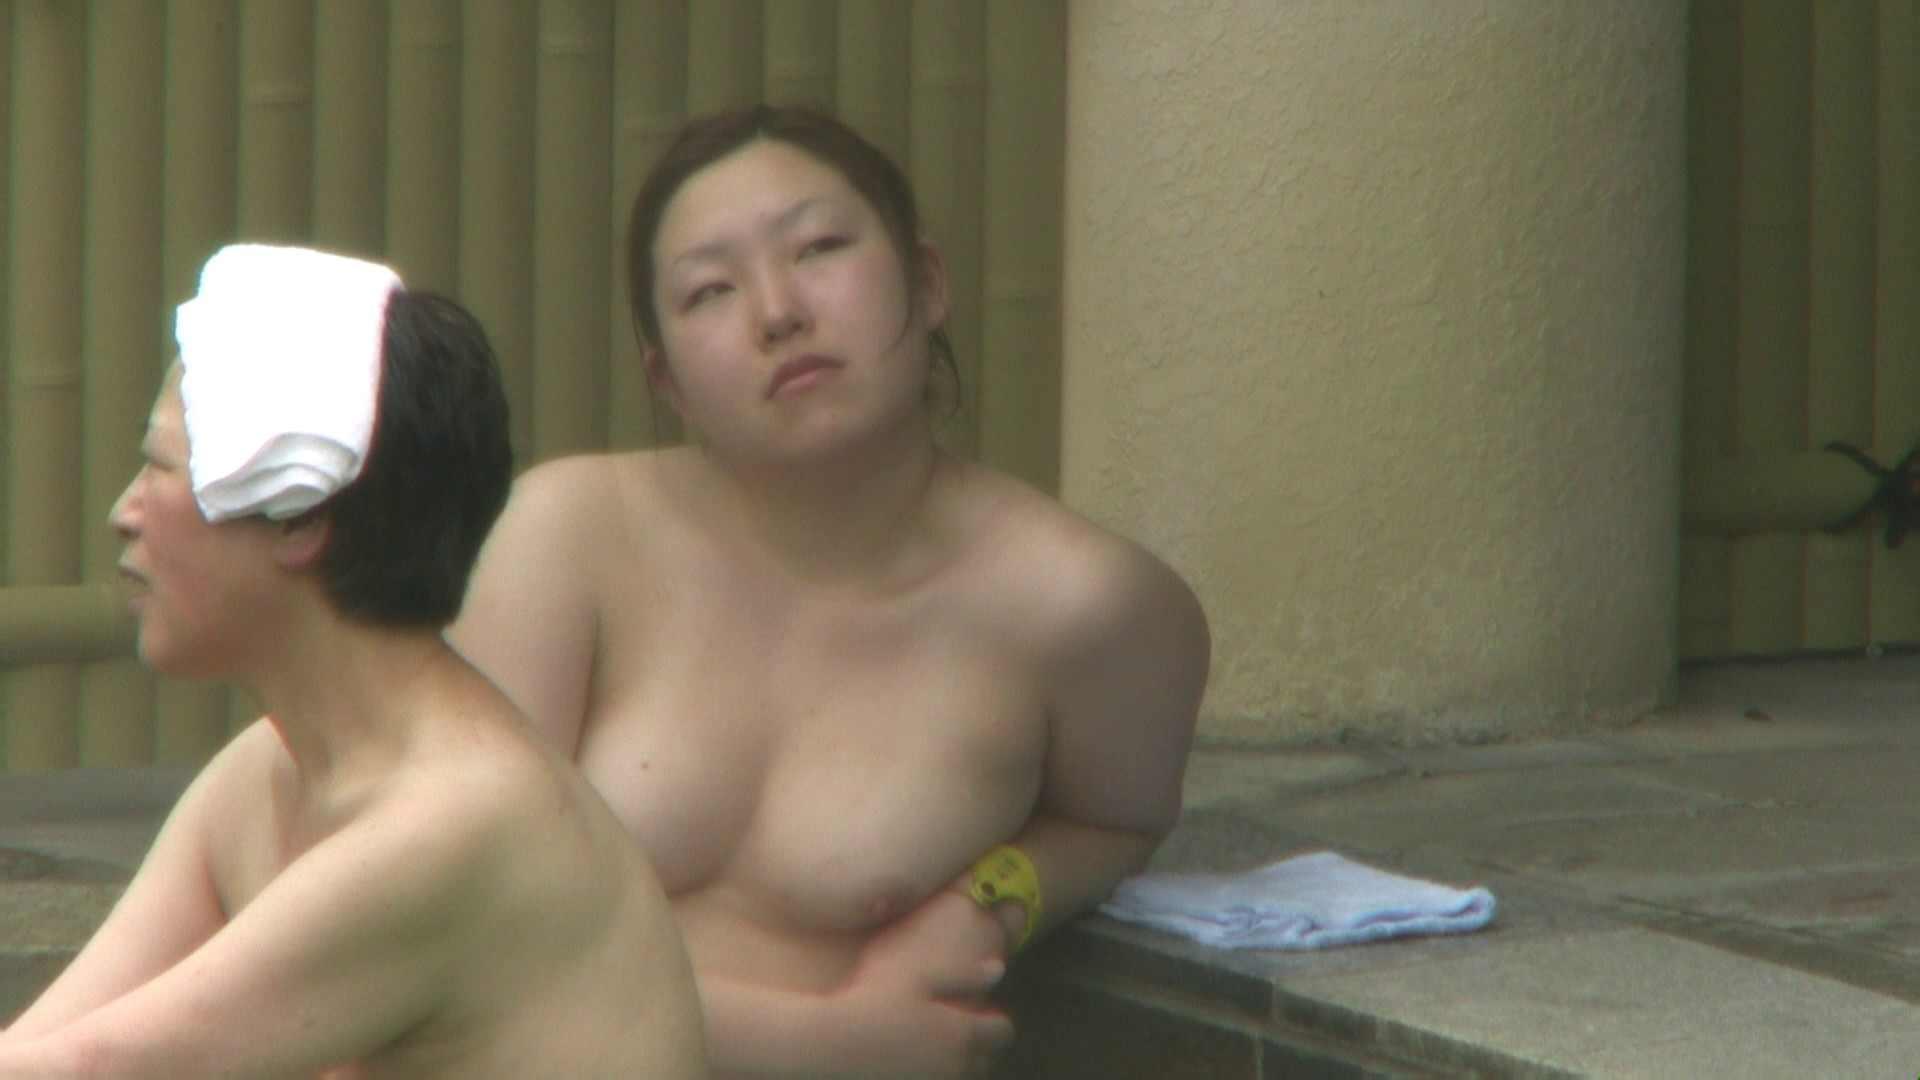 Aquaな露天風呂Vol.72【VIP限定】 0 | 0  47連発 17